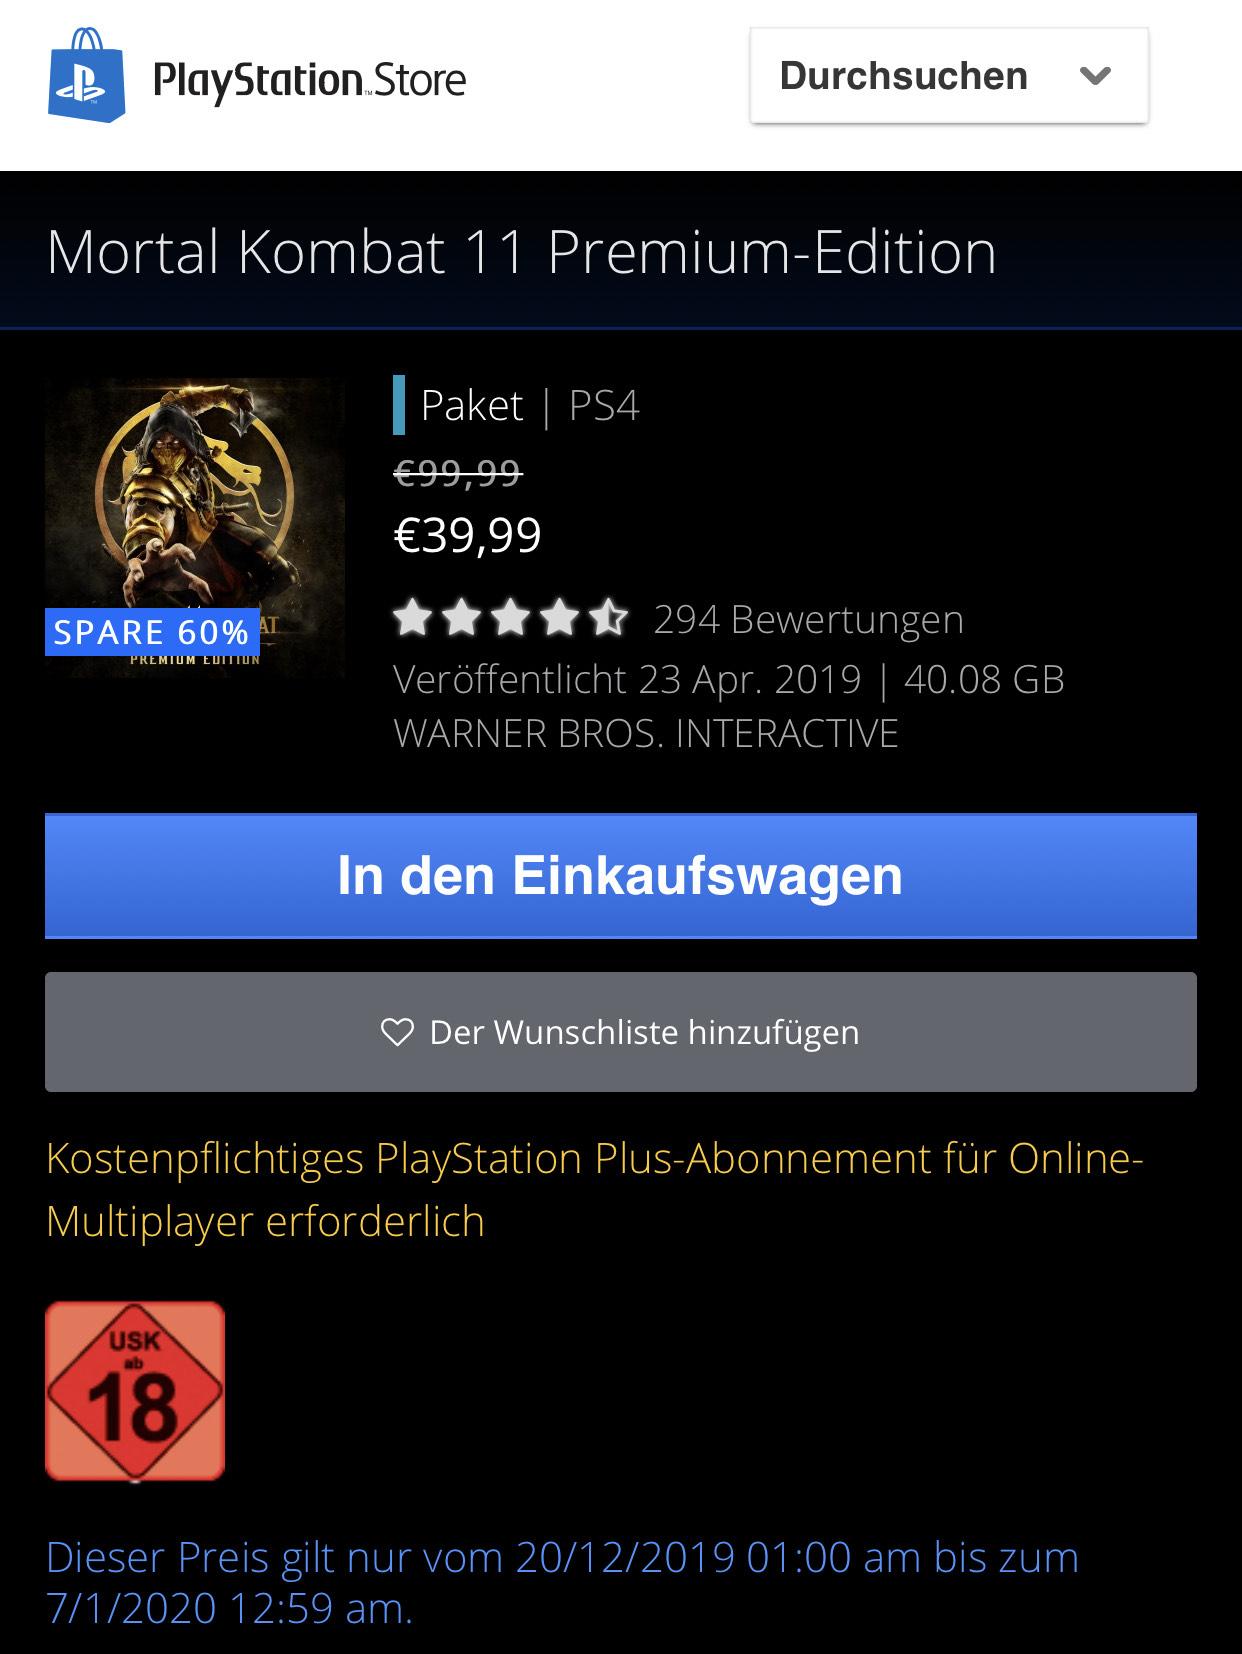 Mortal Kombat 11 Premium-Edition / PS4 - PSN Store